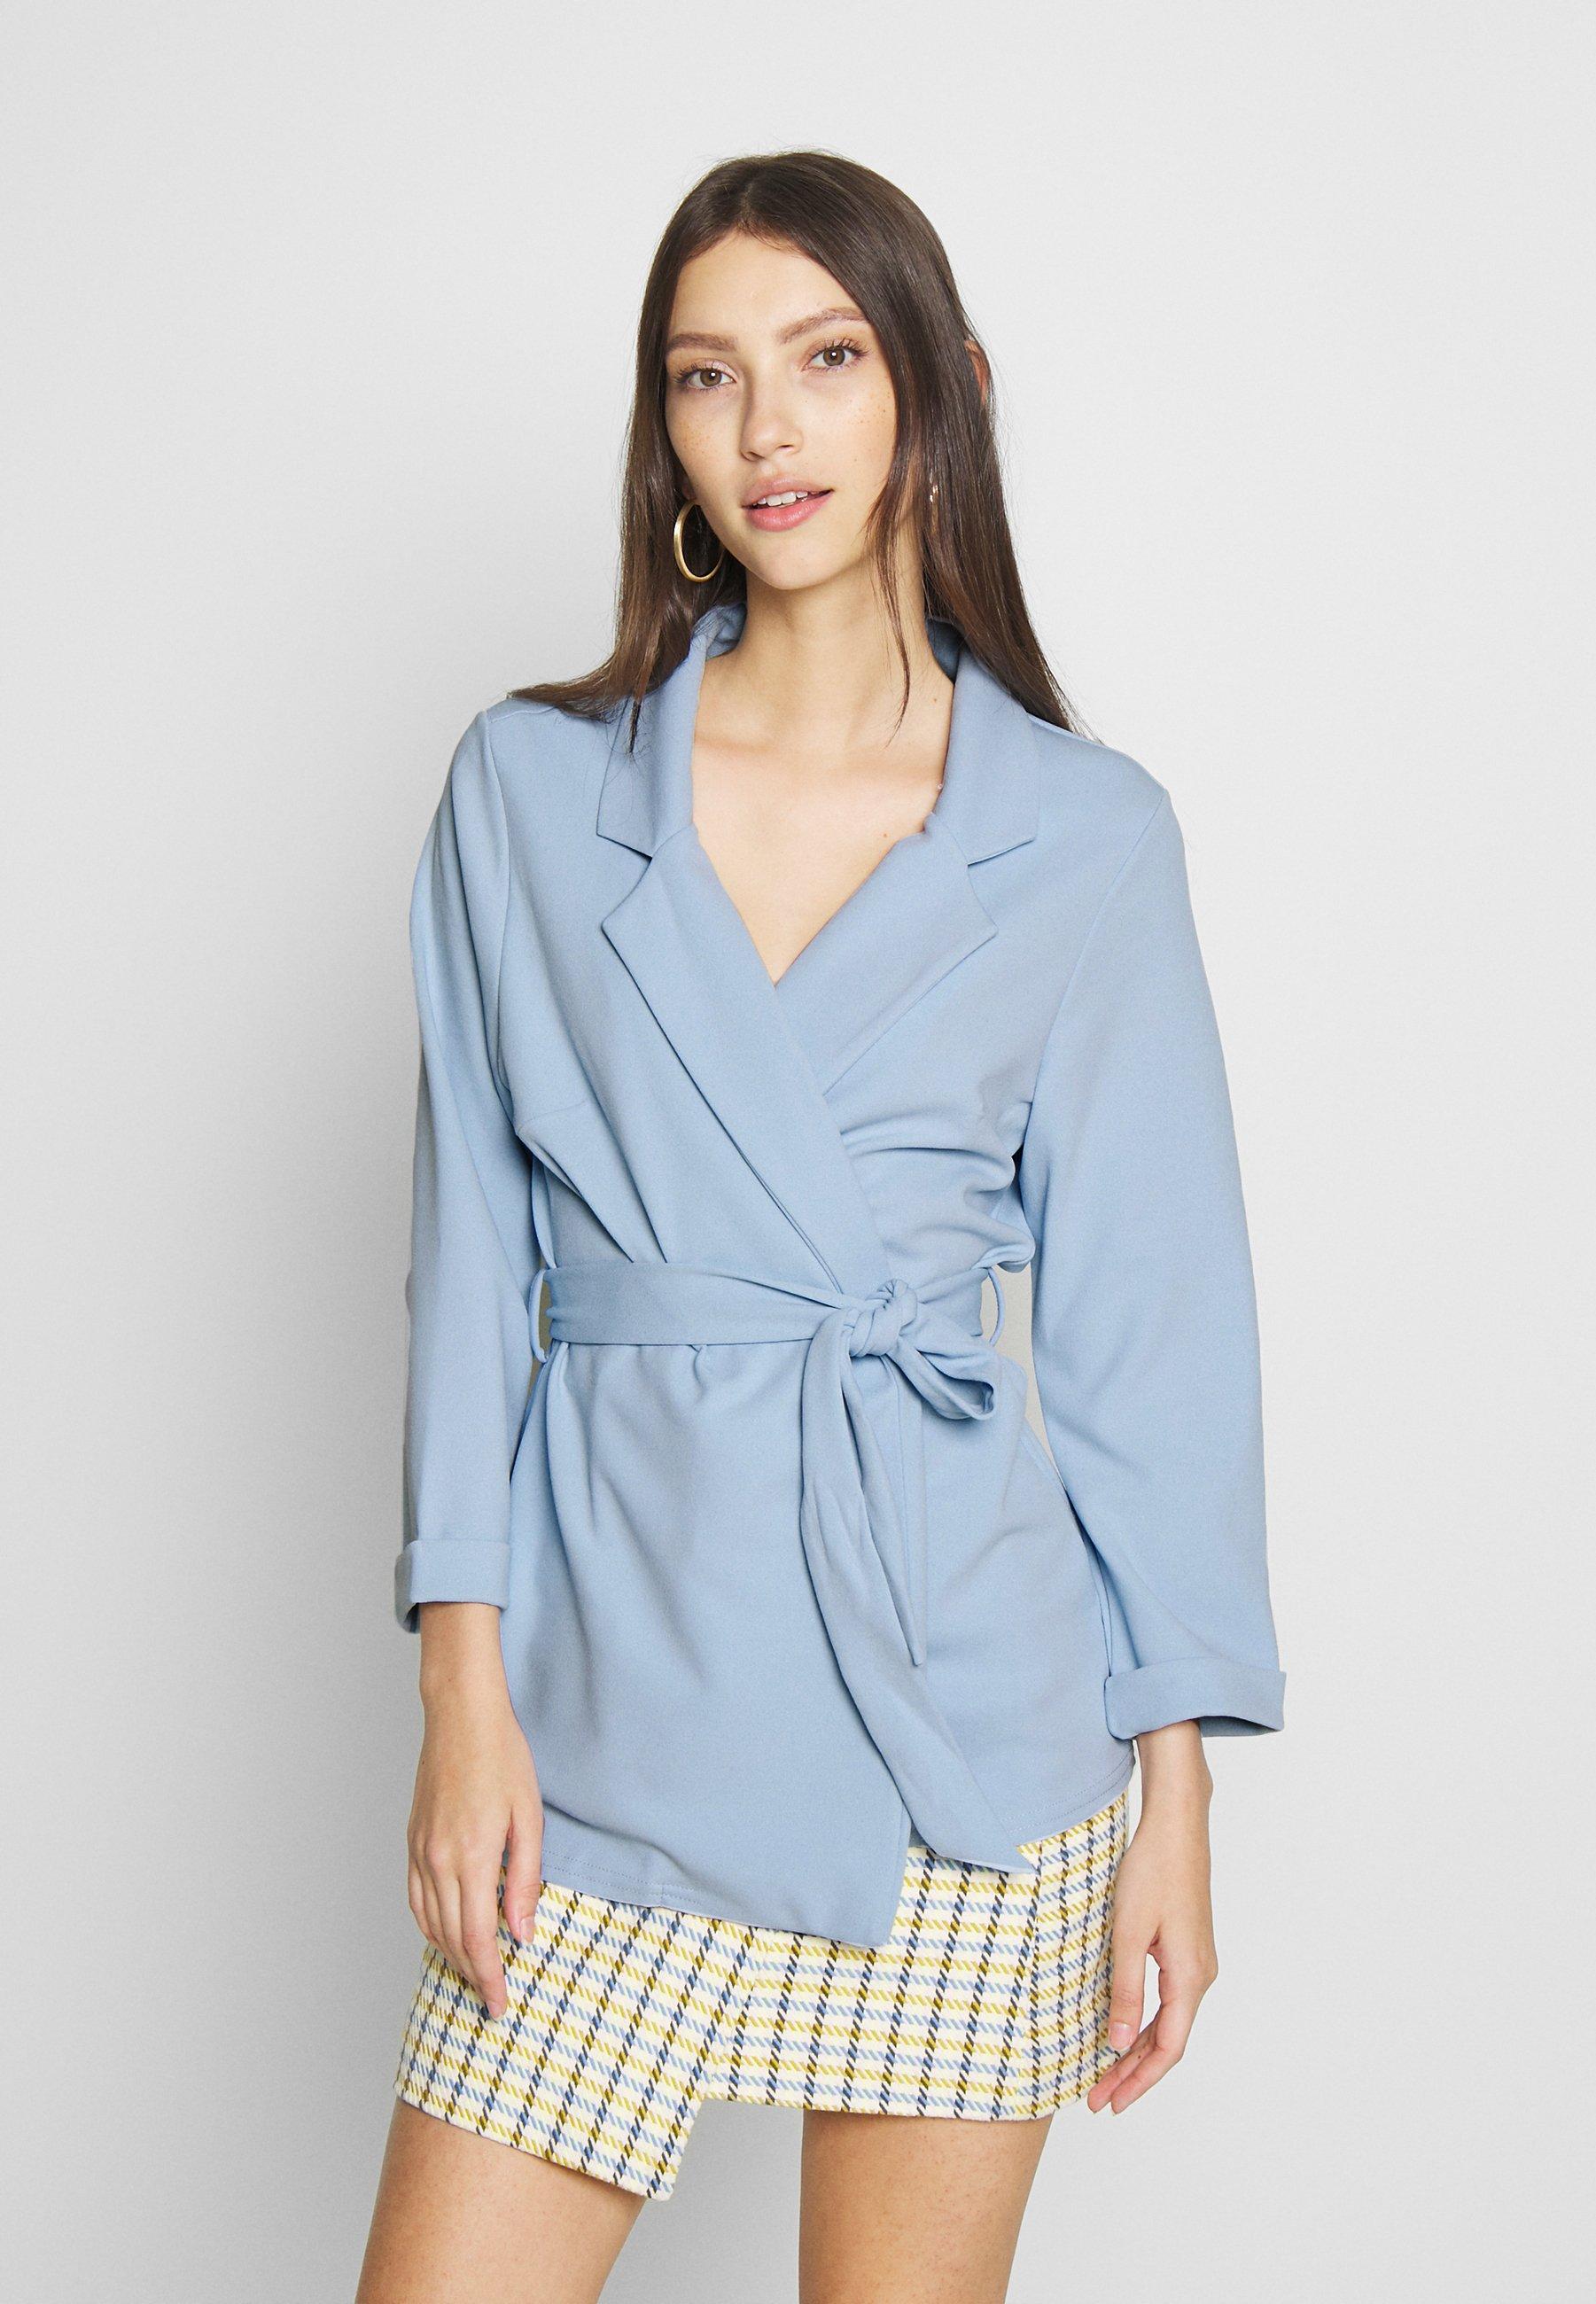 New Look Blazer - light blue